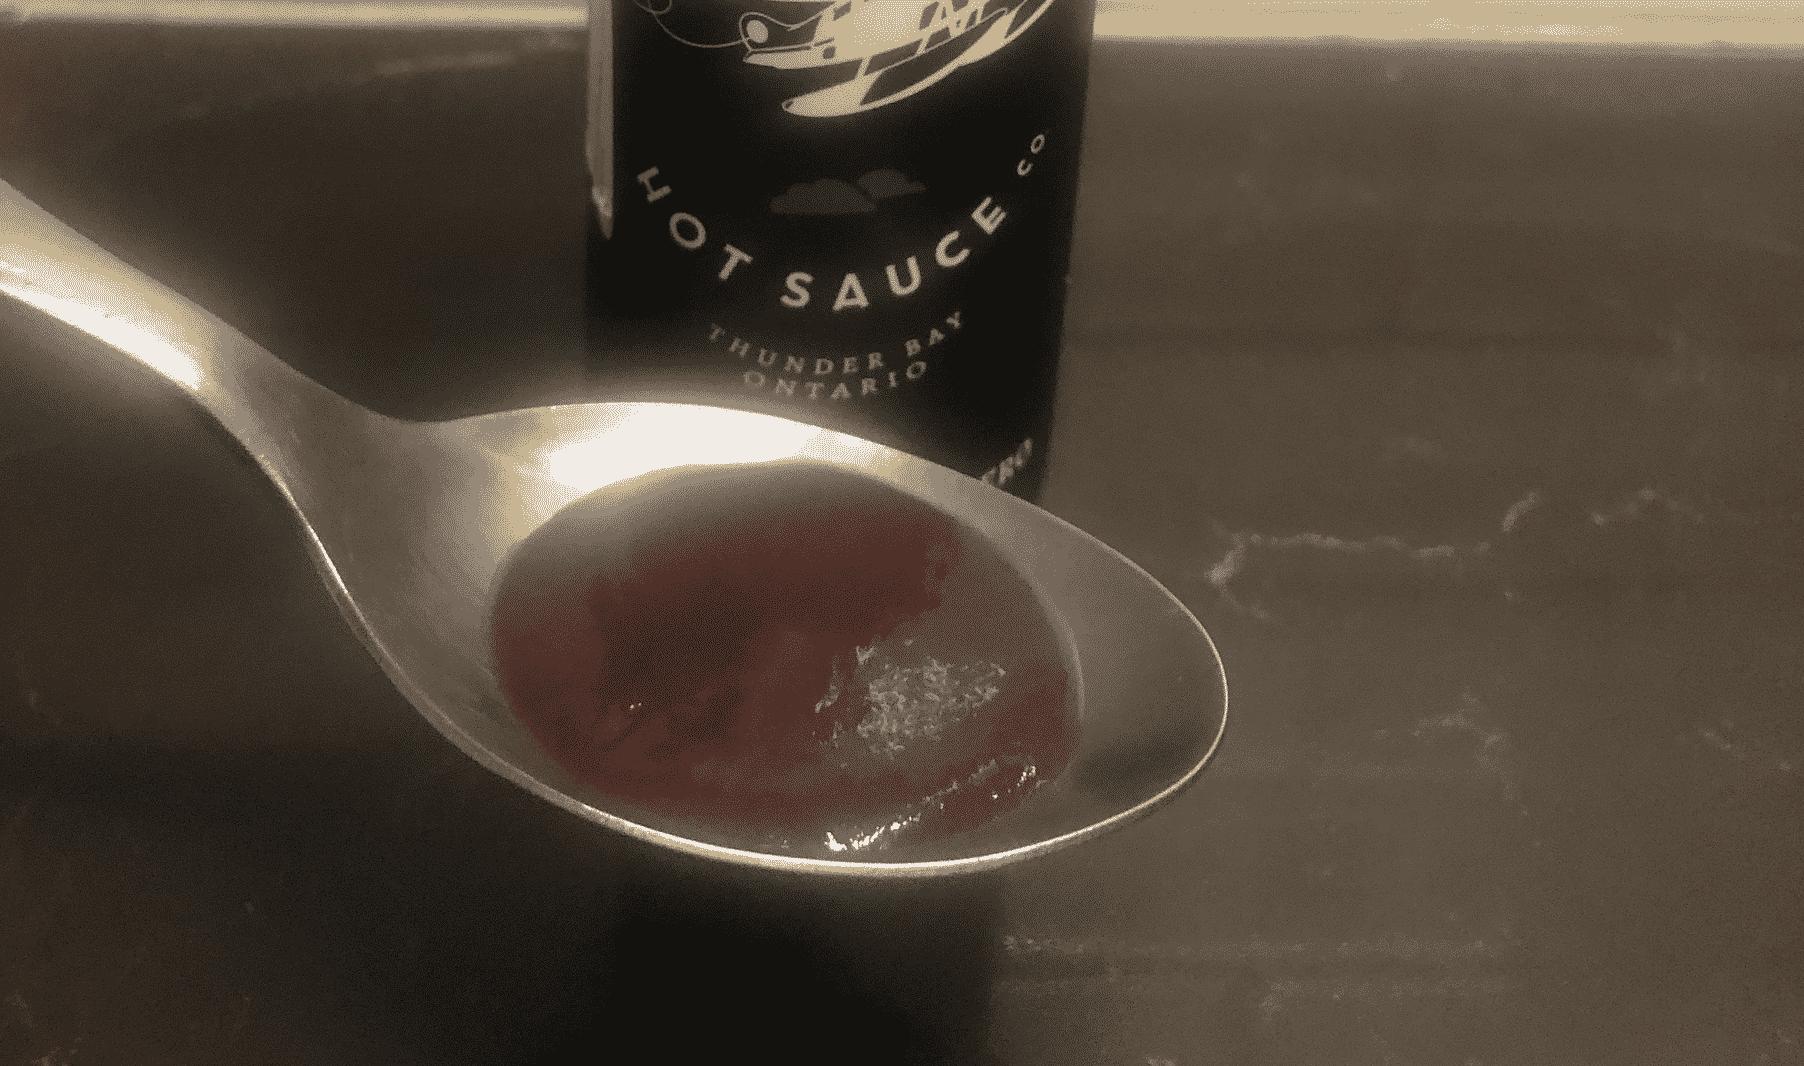 Heartbeat Blueberry Habanero Sauce in spoon